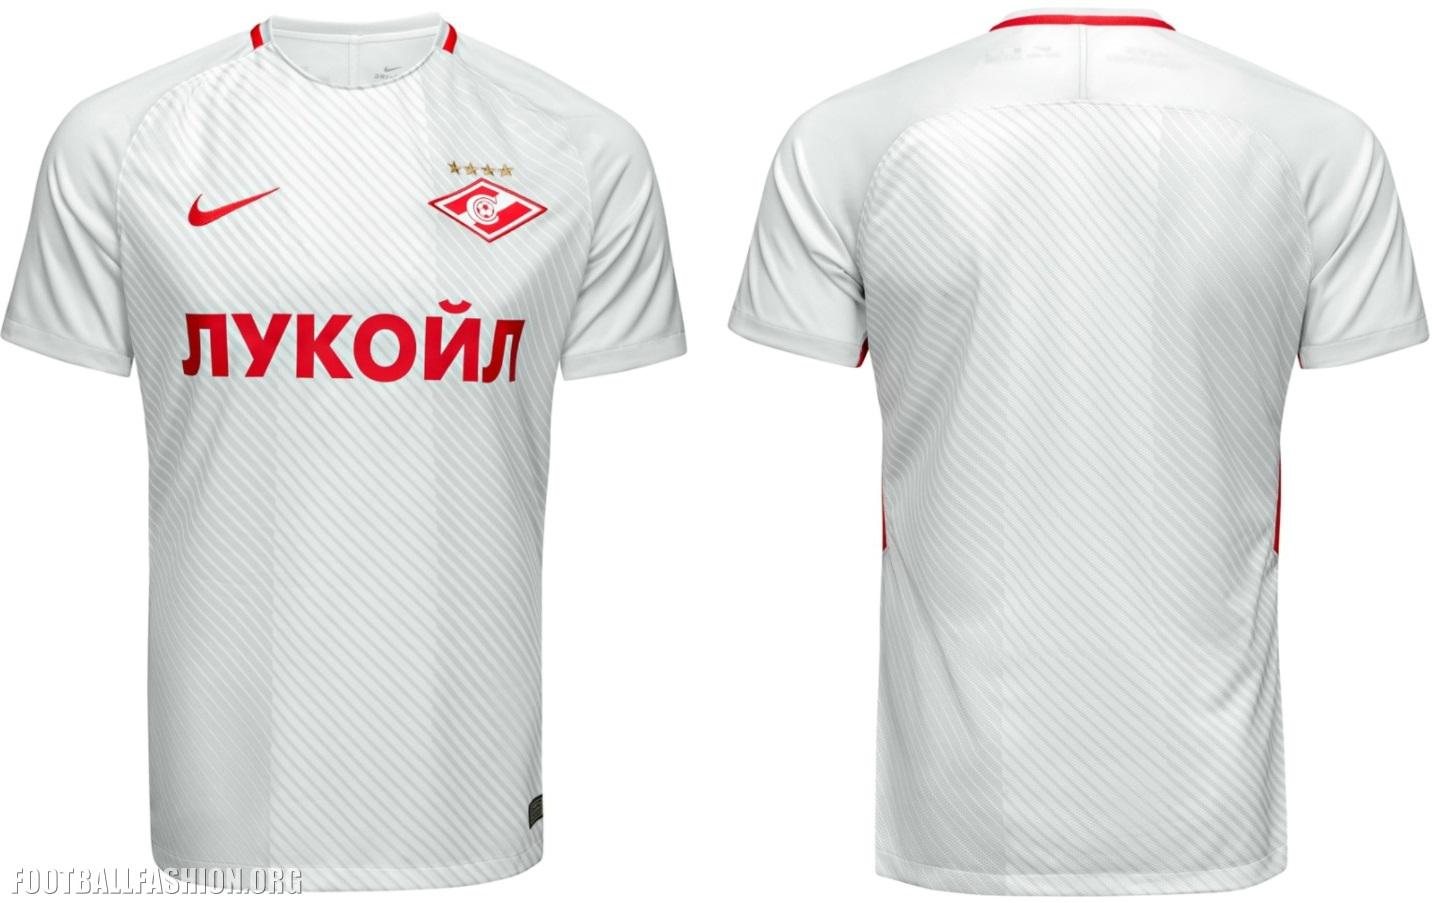 ae84280efe8 Spartak Moscow 2017 18 Nike Home and Away Kits - FOOTBALL FASHION.ORG